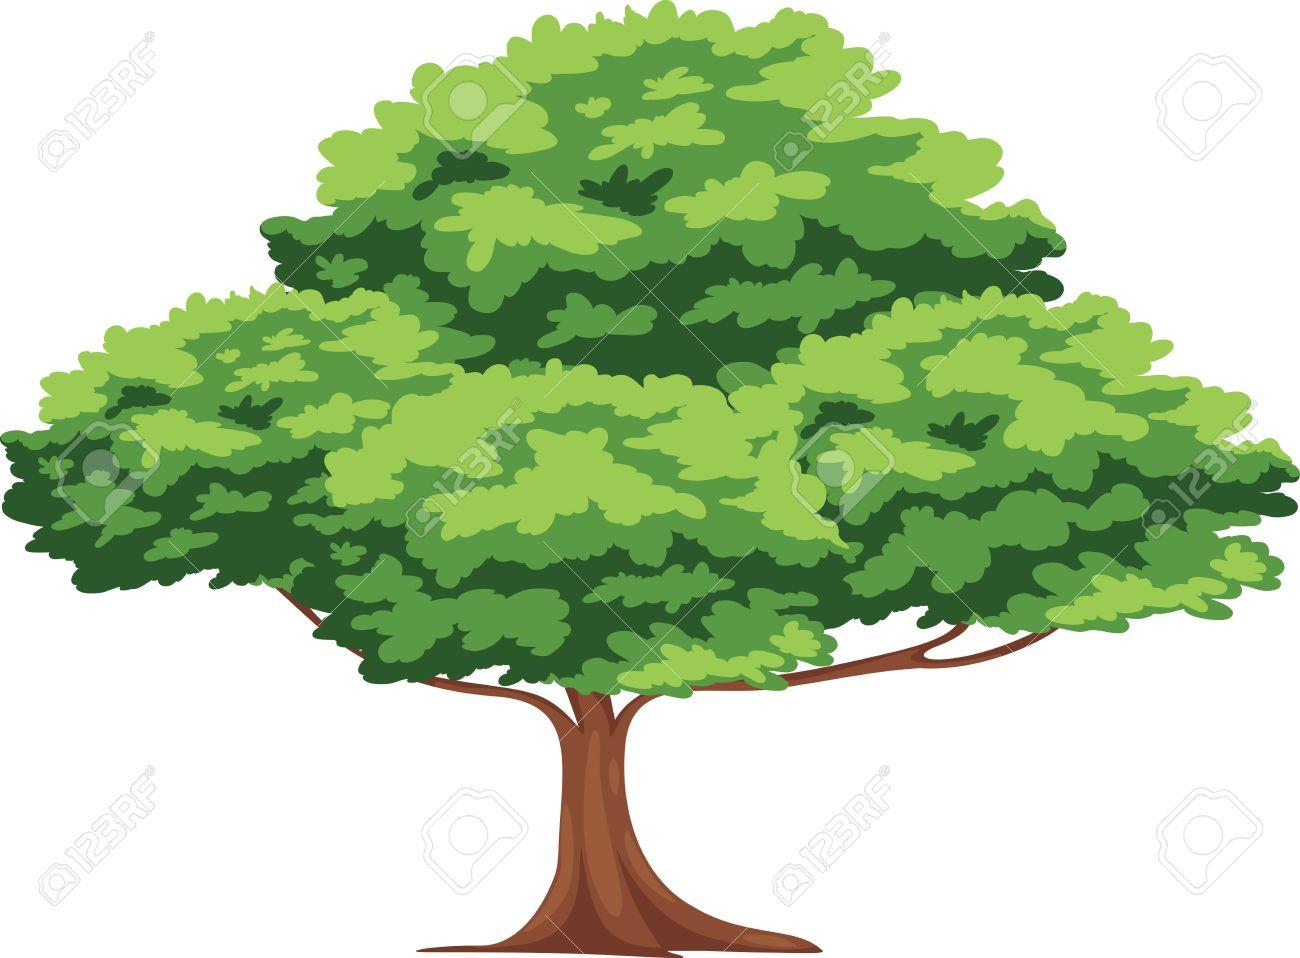 Tree PNG Vector - 56481